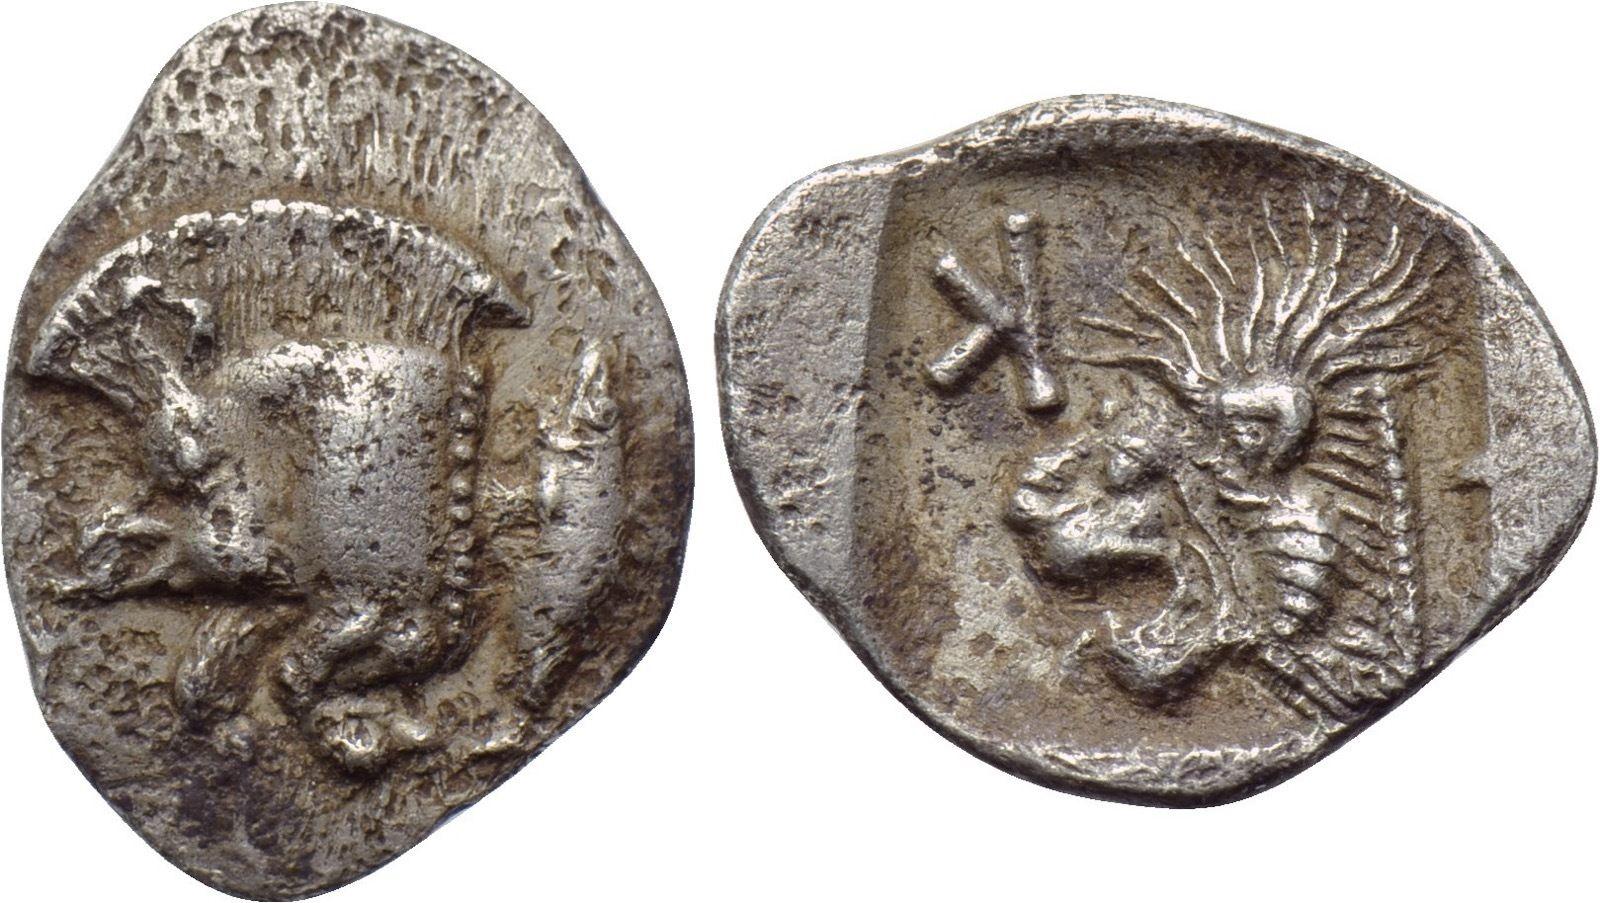 Óbolo de Kyzikos de la regíon de Mysia a identificar 2ewp07k